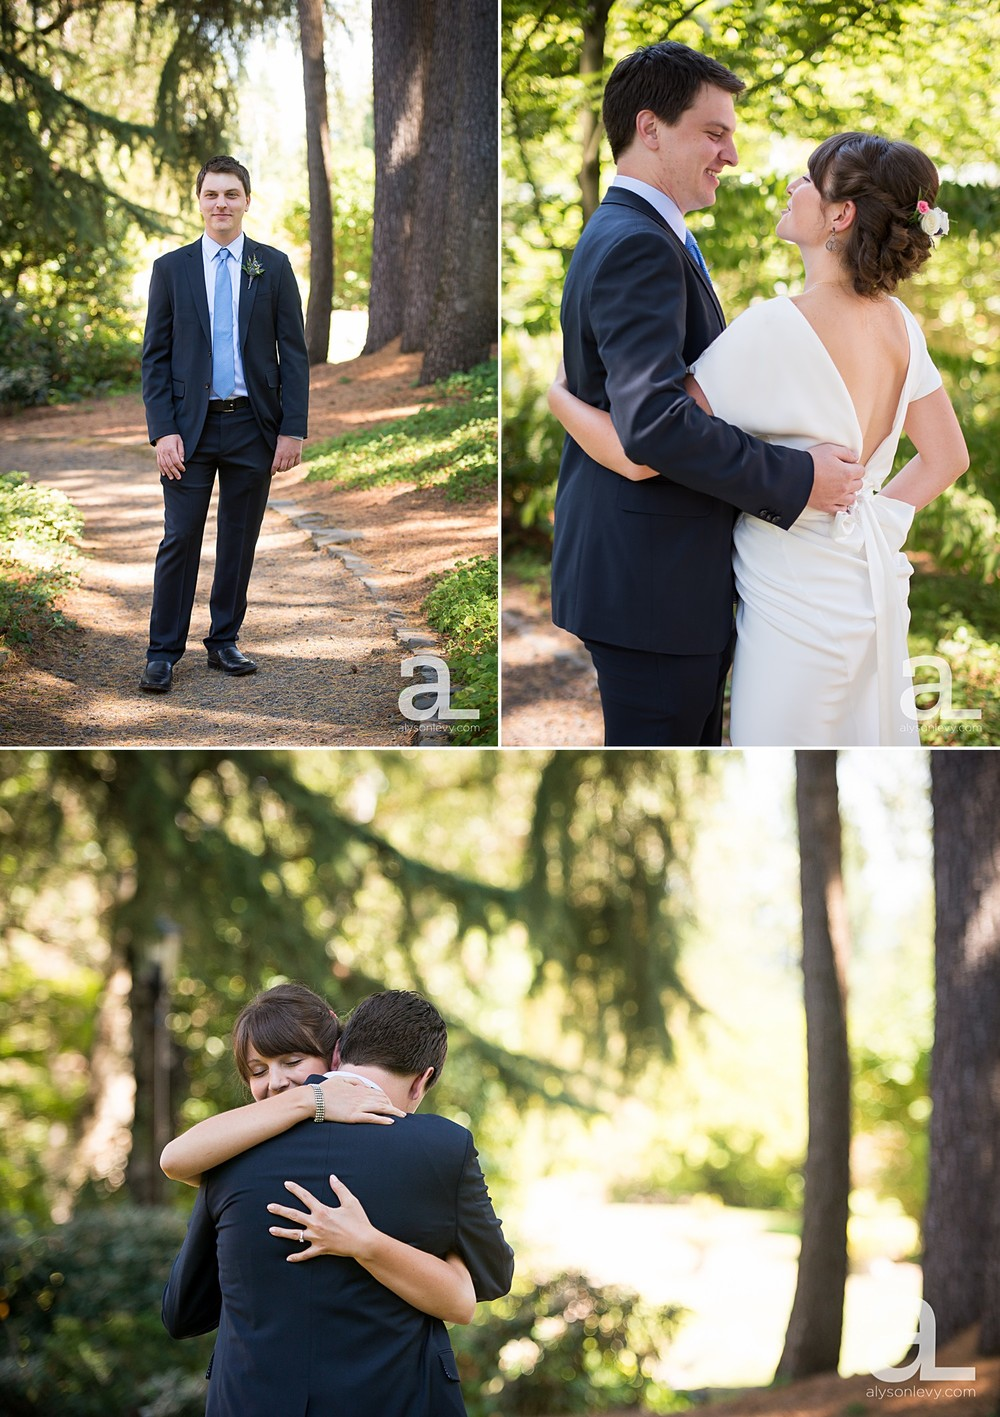 Lewis-Clark-Estate-Gardens-Portland-Wedding-Photography_0003.jpg